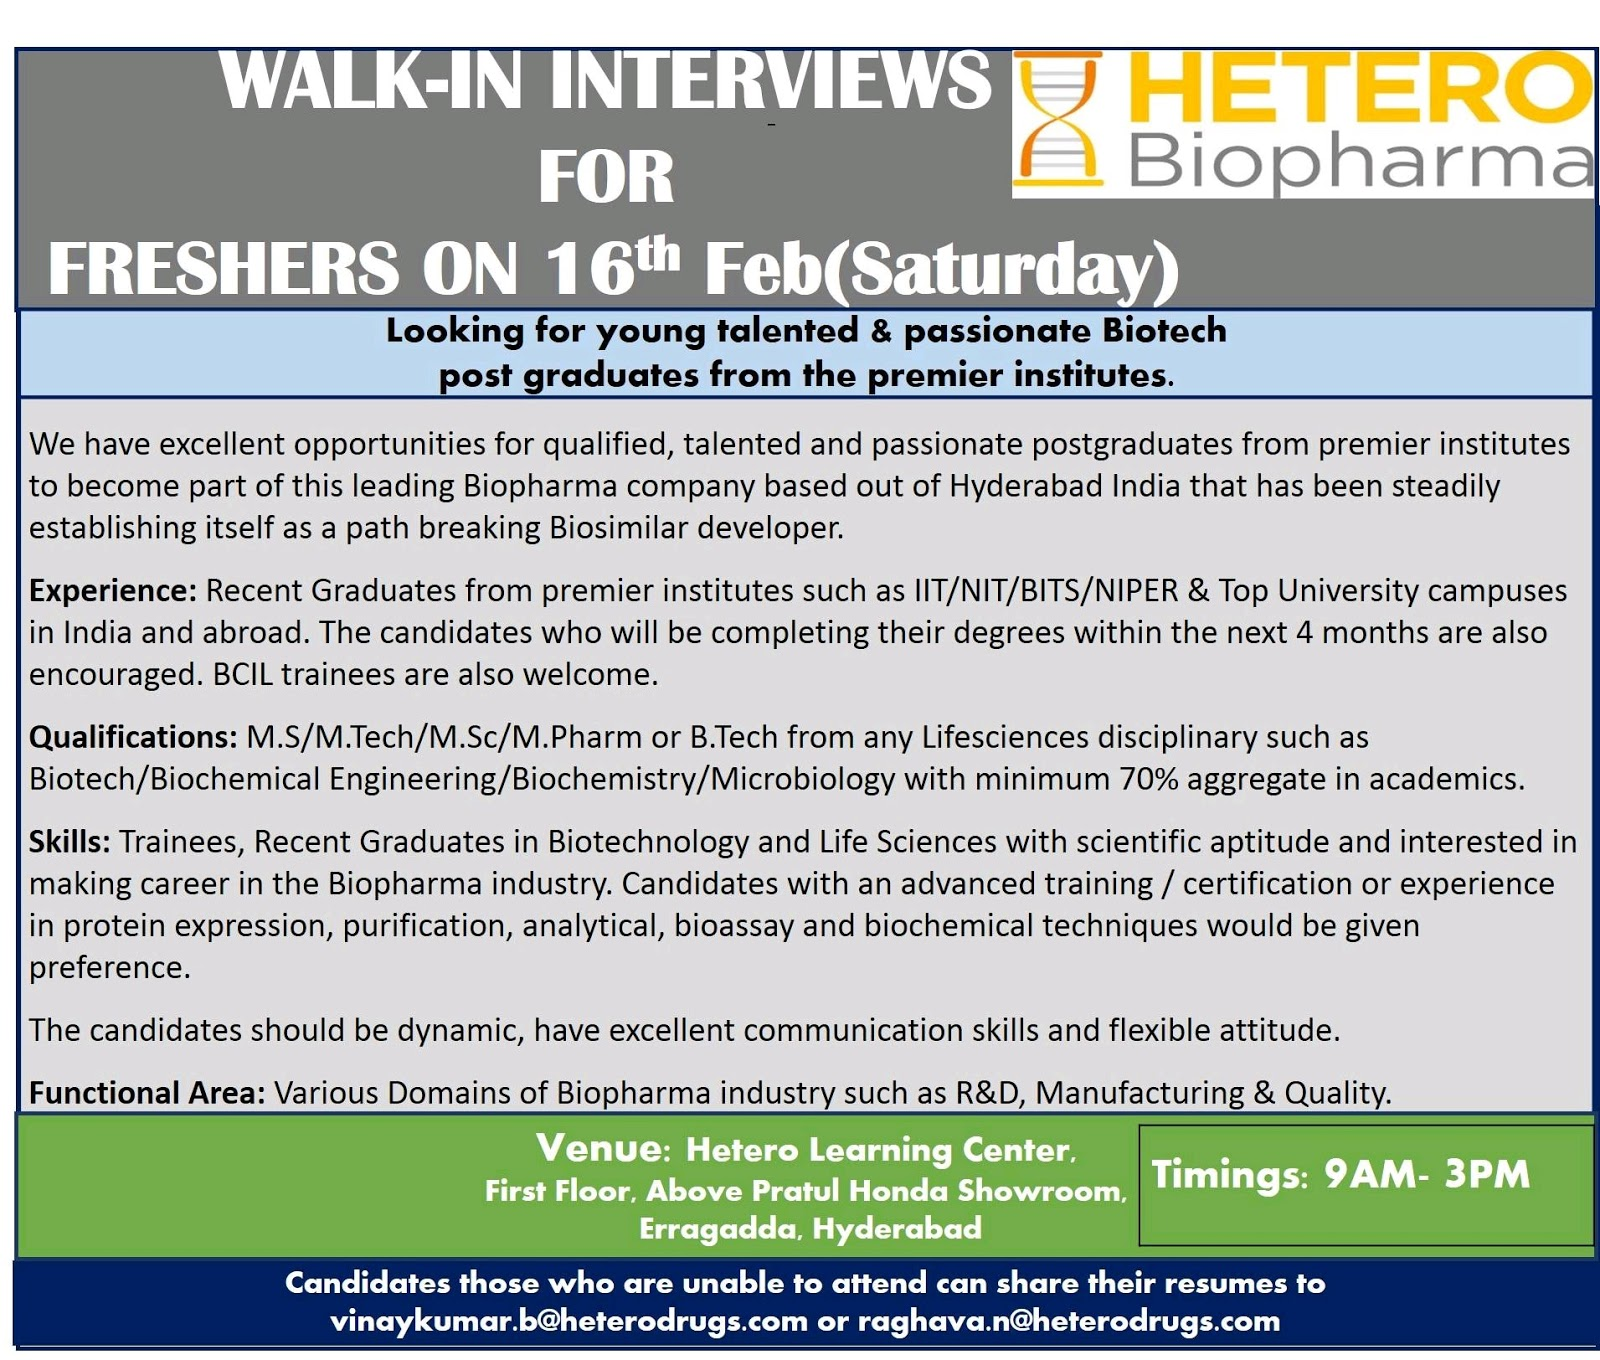 Hetero Biopharma Walk-In Interviews for Freshers on 16th Feb